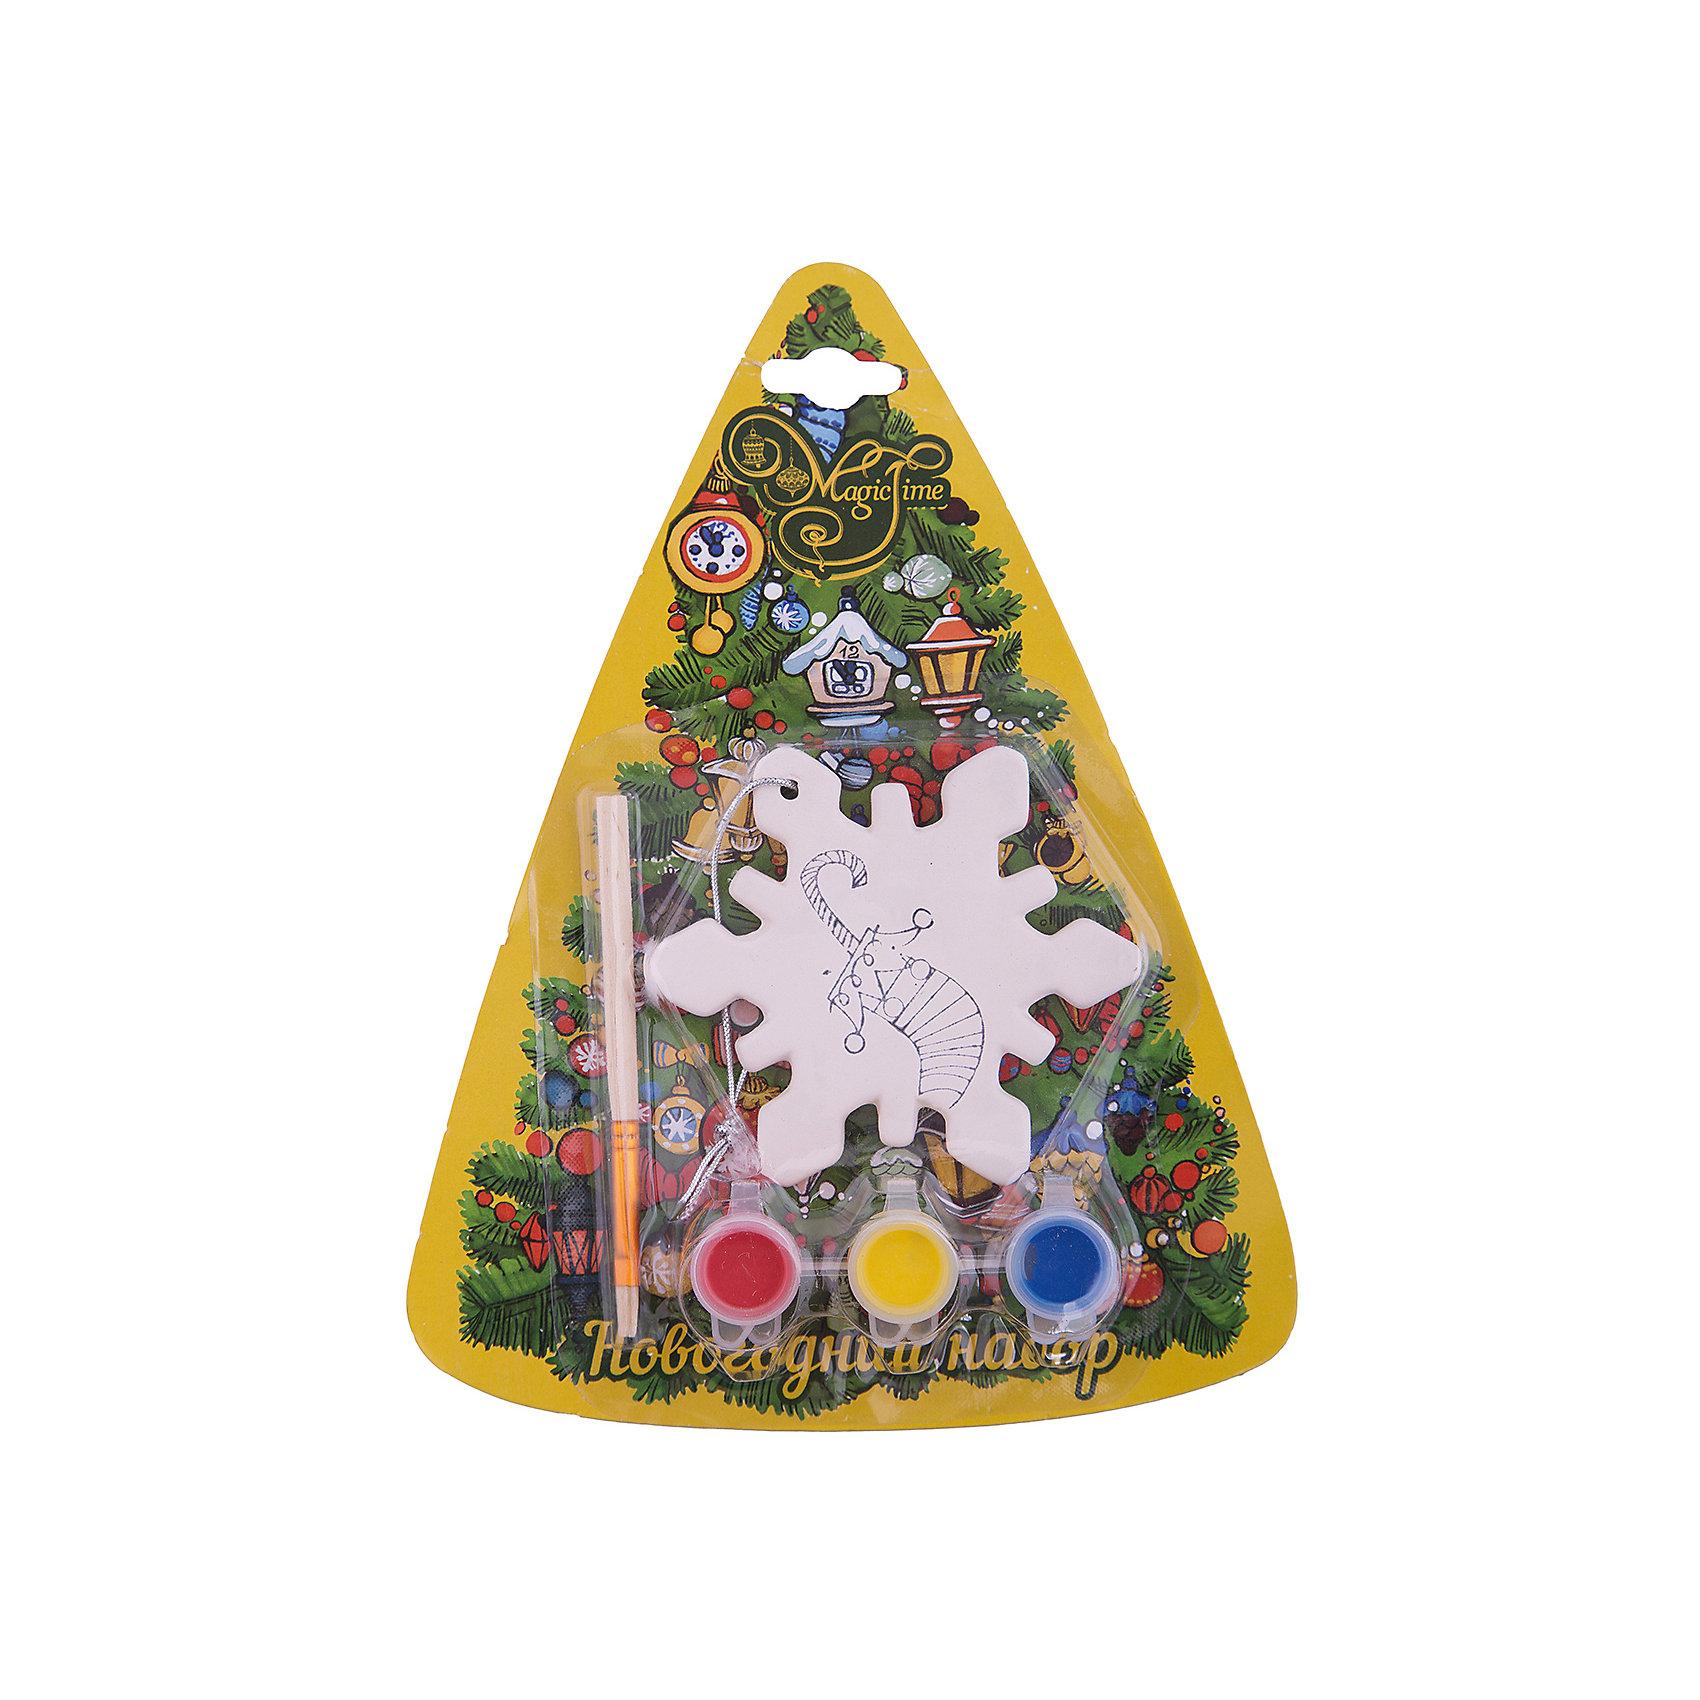 Magic Time Набор для творчества Снежинка набор для творчества creative creative набор для творчества гелевые свечи